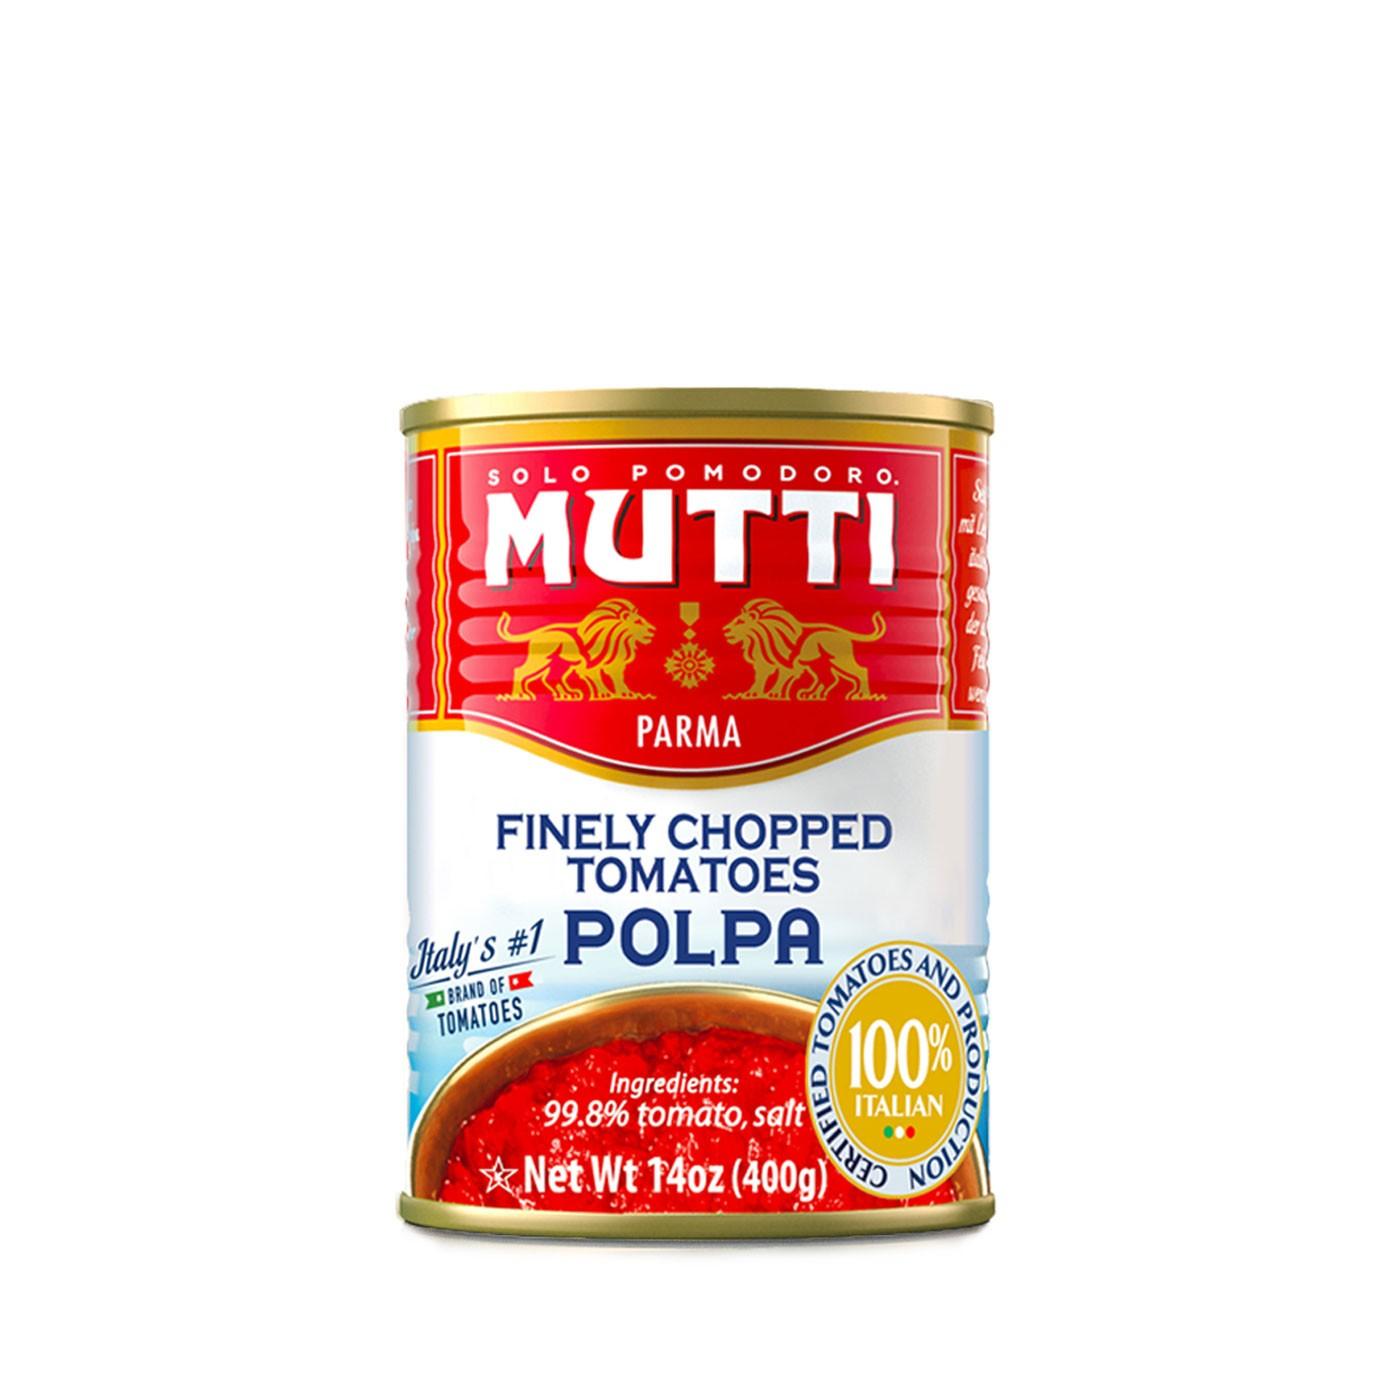 Chopped Tomatoes 24 oz - Mutti | Eataly.com